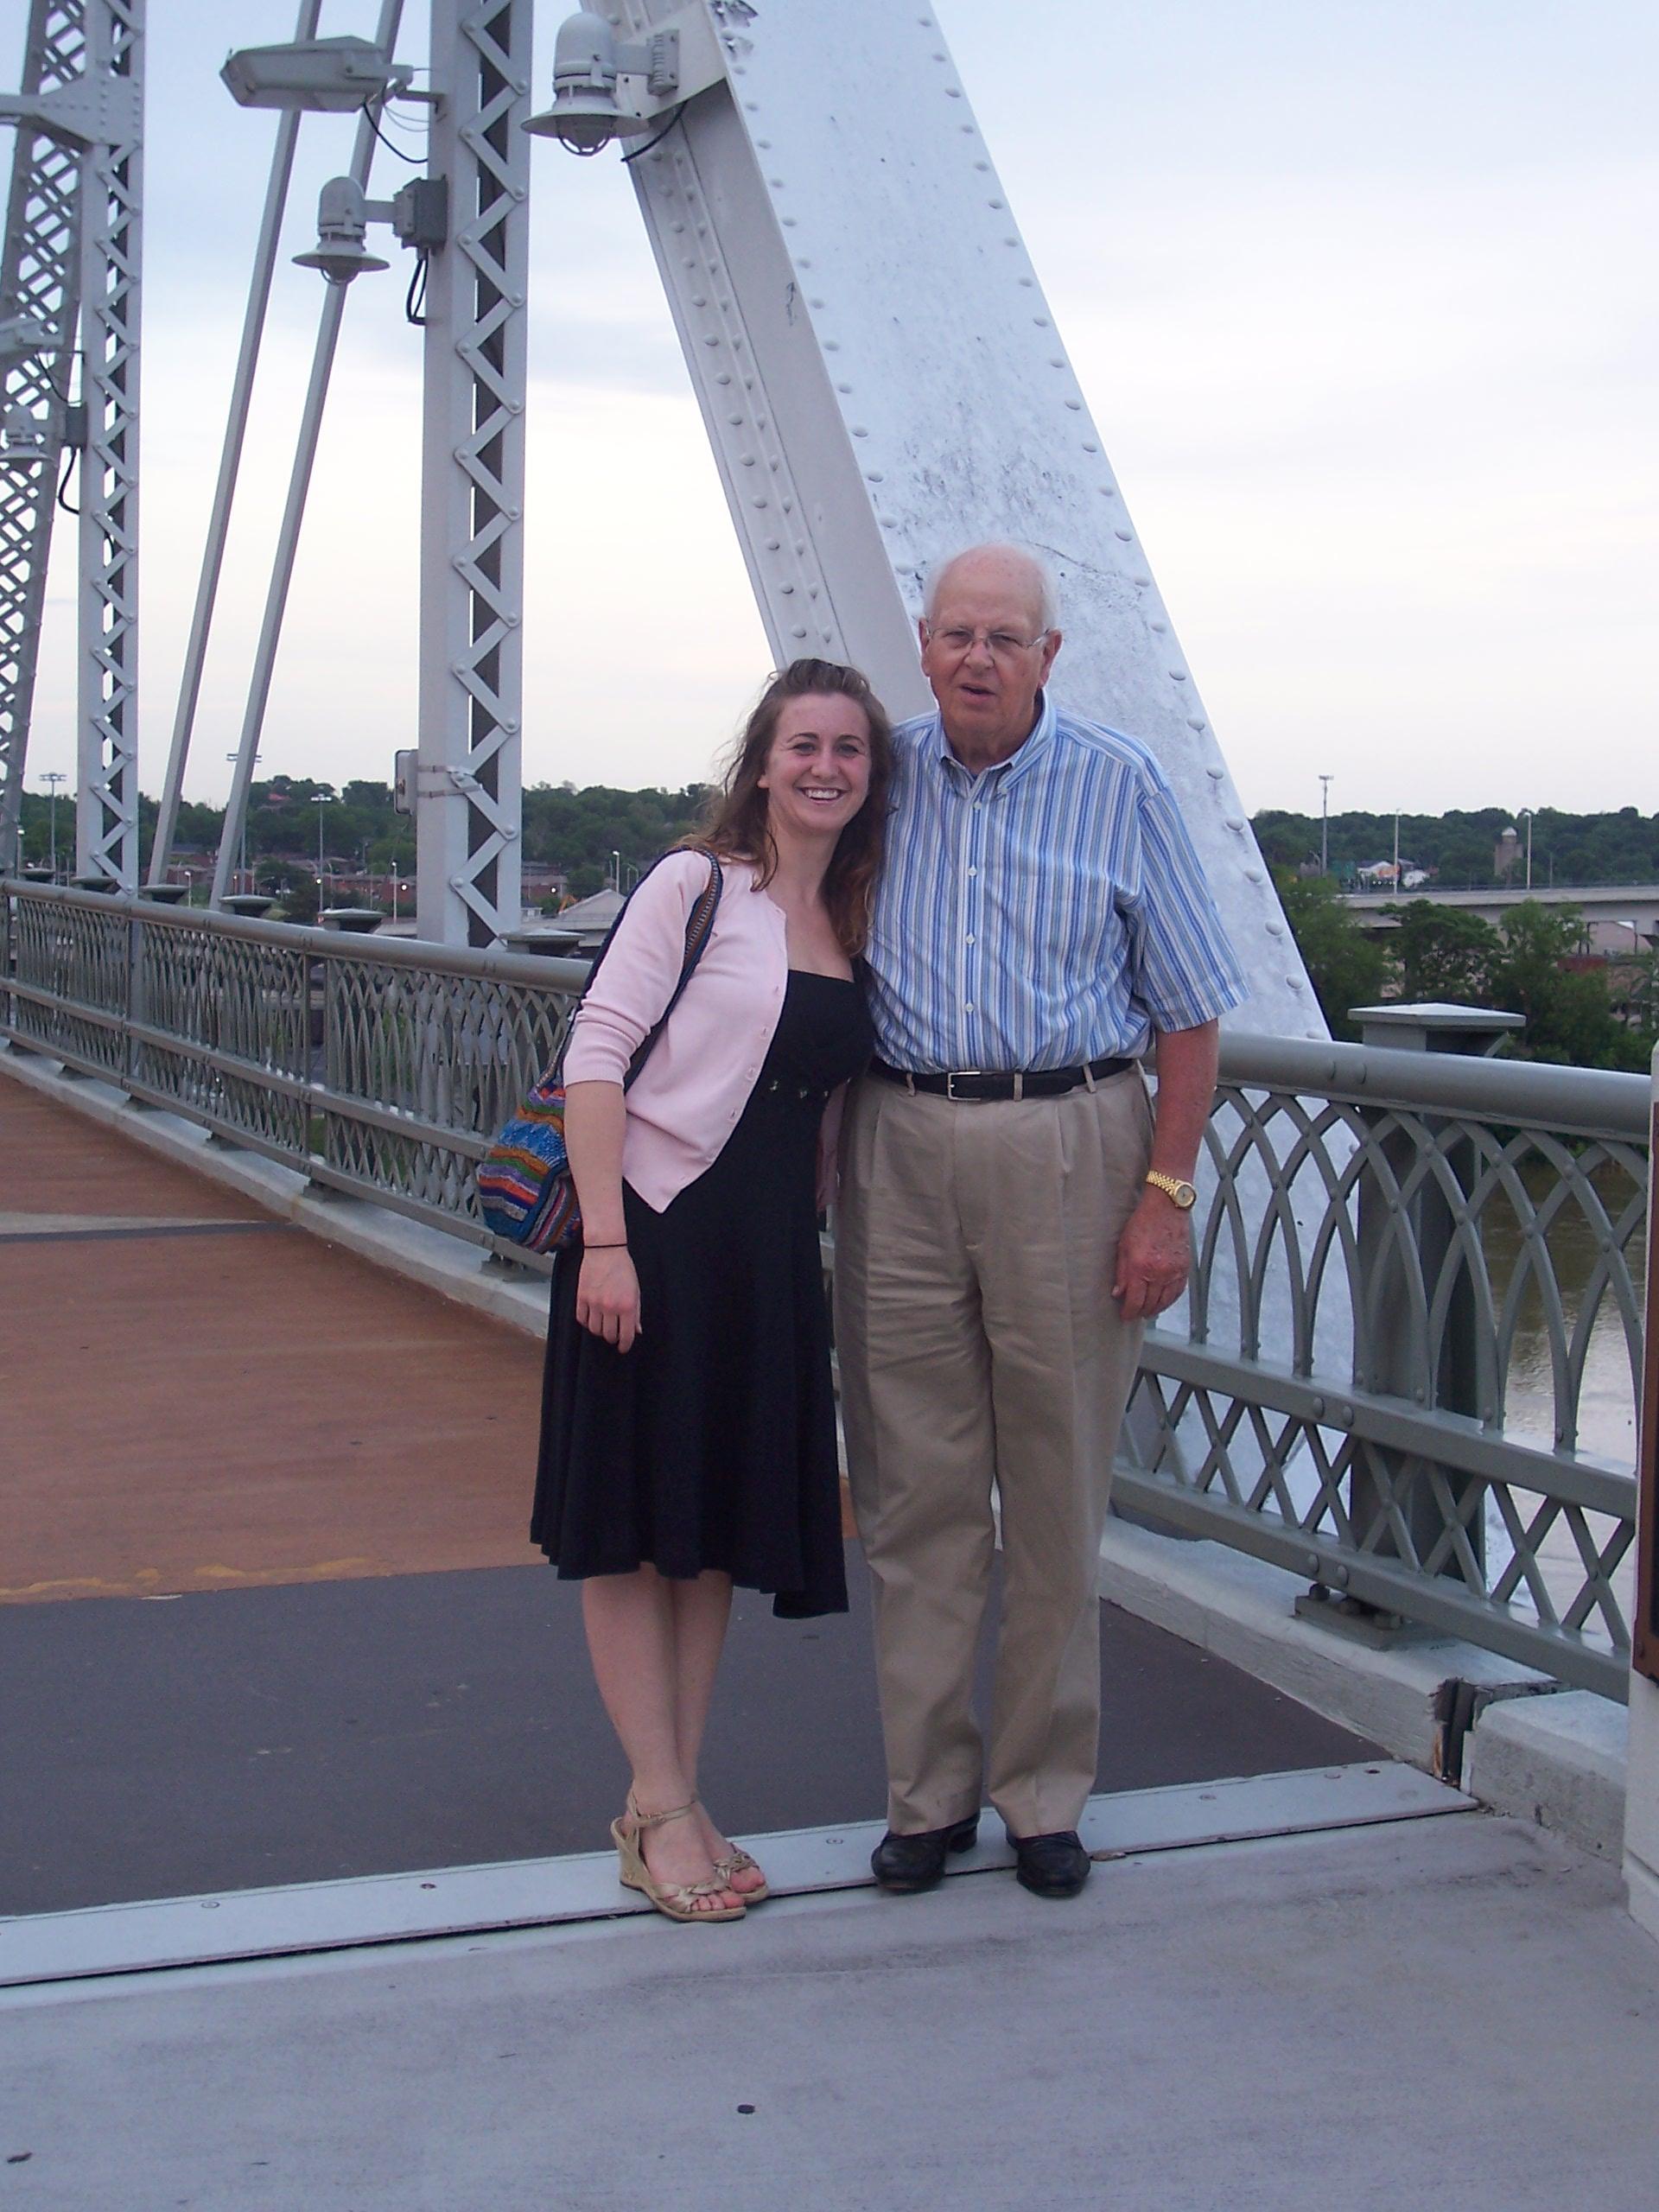 Shelby Street Walking Bridge, Nashville, Tennessee